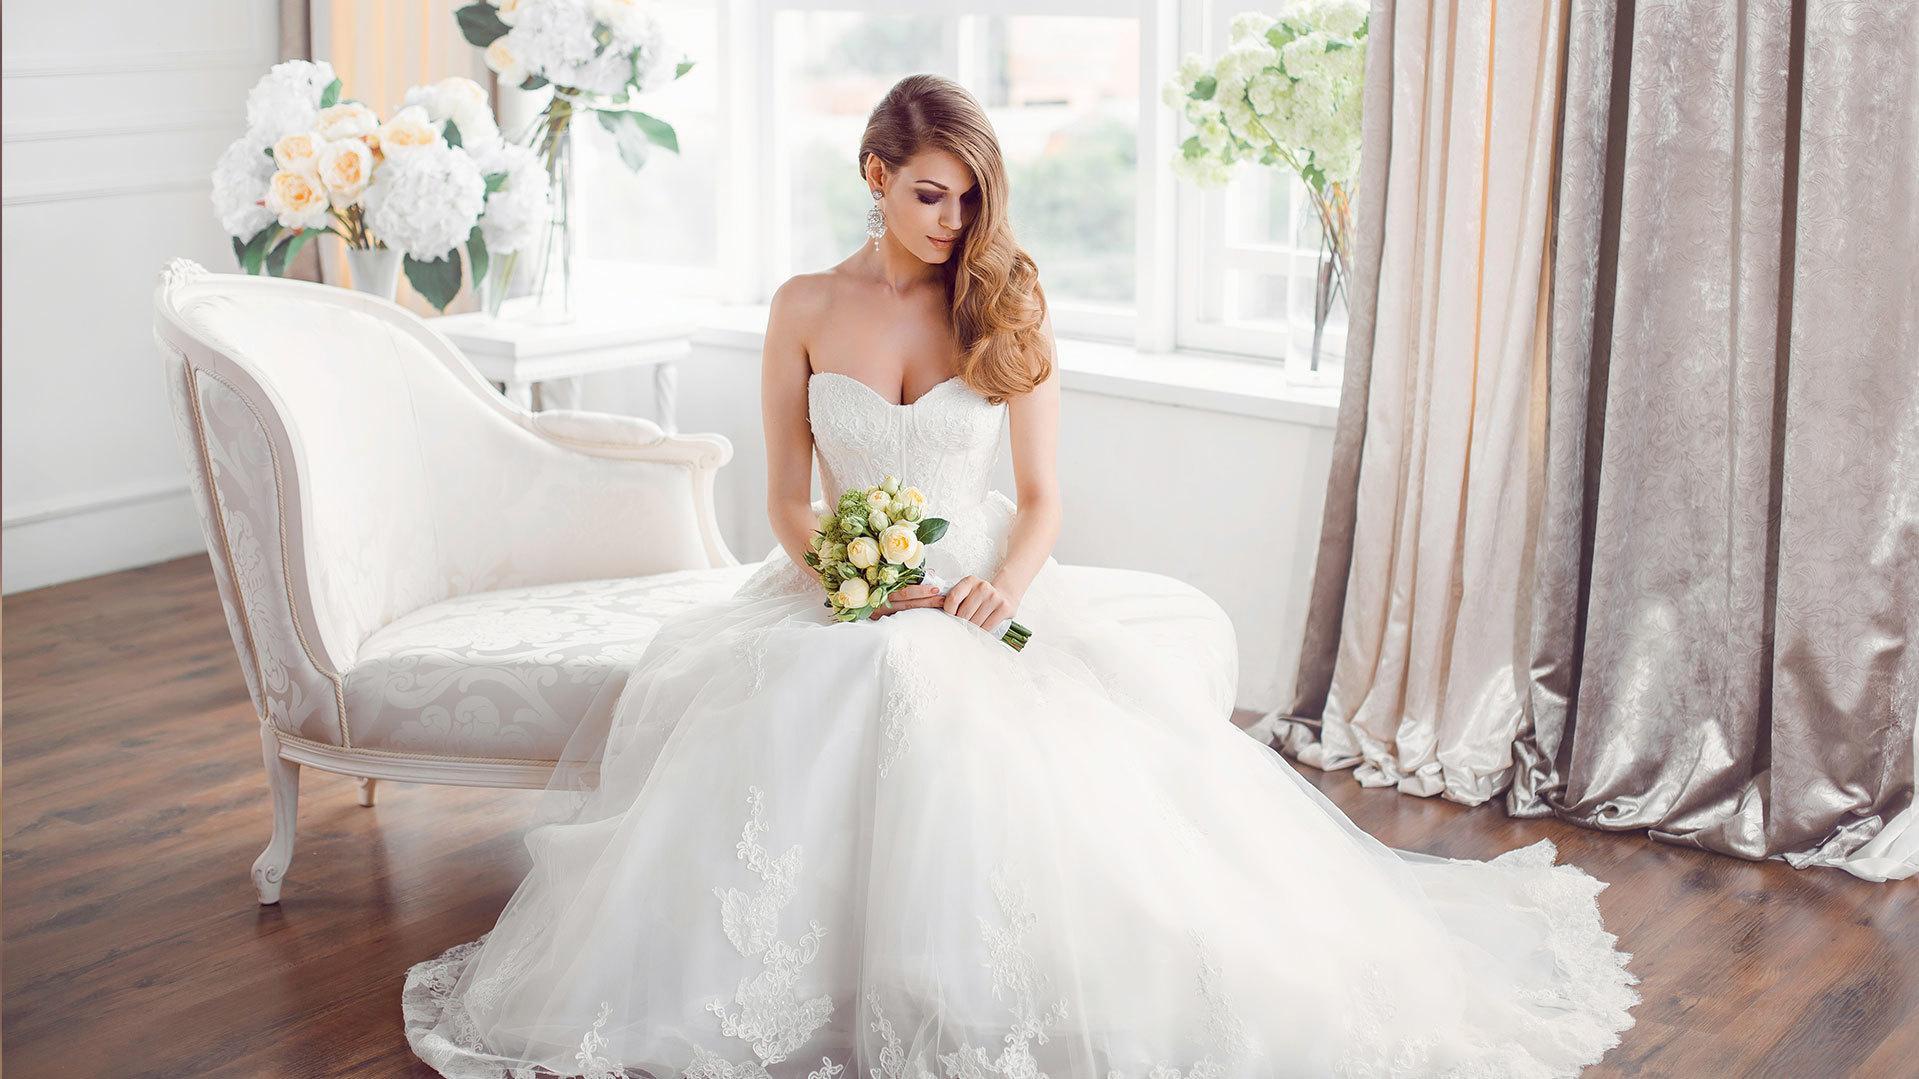 fa69d7483 Wedding Dress Outlet in Soham. peters bridal warehouse soham